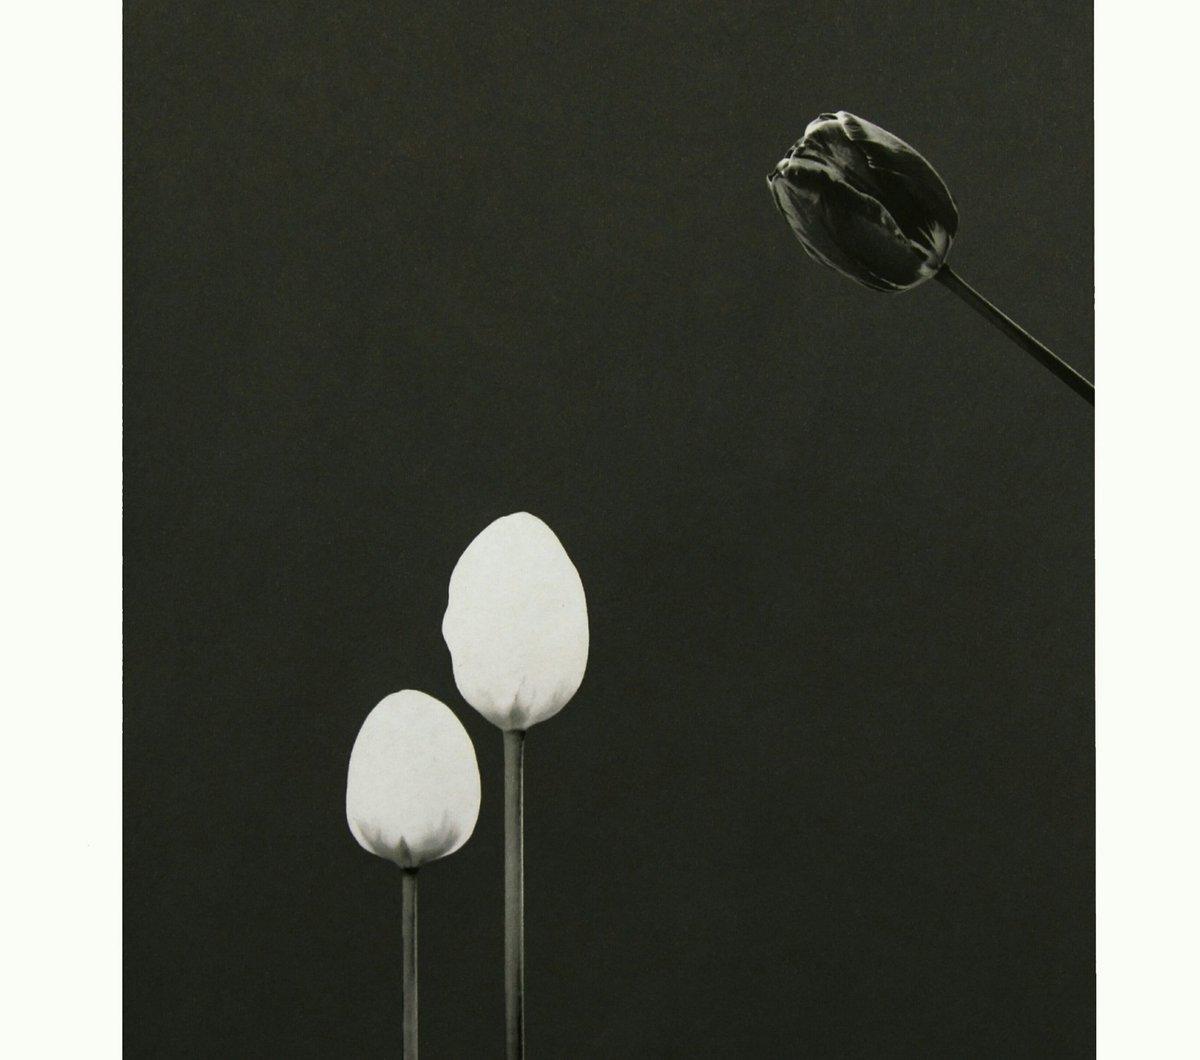 """PURE DILEMMA"" M.Rozenfield   Price: 300.393.00$ (Limited of 3)  #puredilemma #photooftheday #artworld #artoftheday #artgallery #artcollector #art #fineartprint #finearts #fineartflowers #fineartphotography #blackandwhitephotography #blossom #blackandwhite #tulip #thx everyone!)"